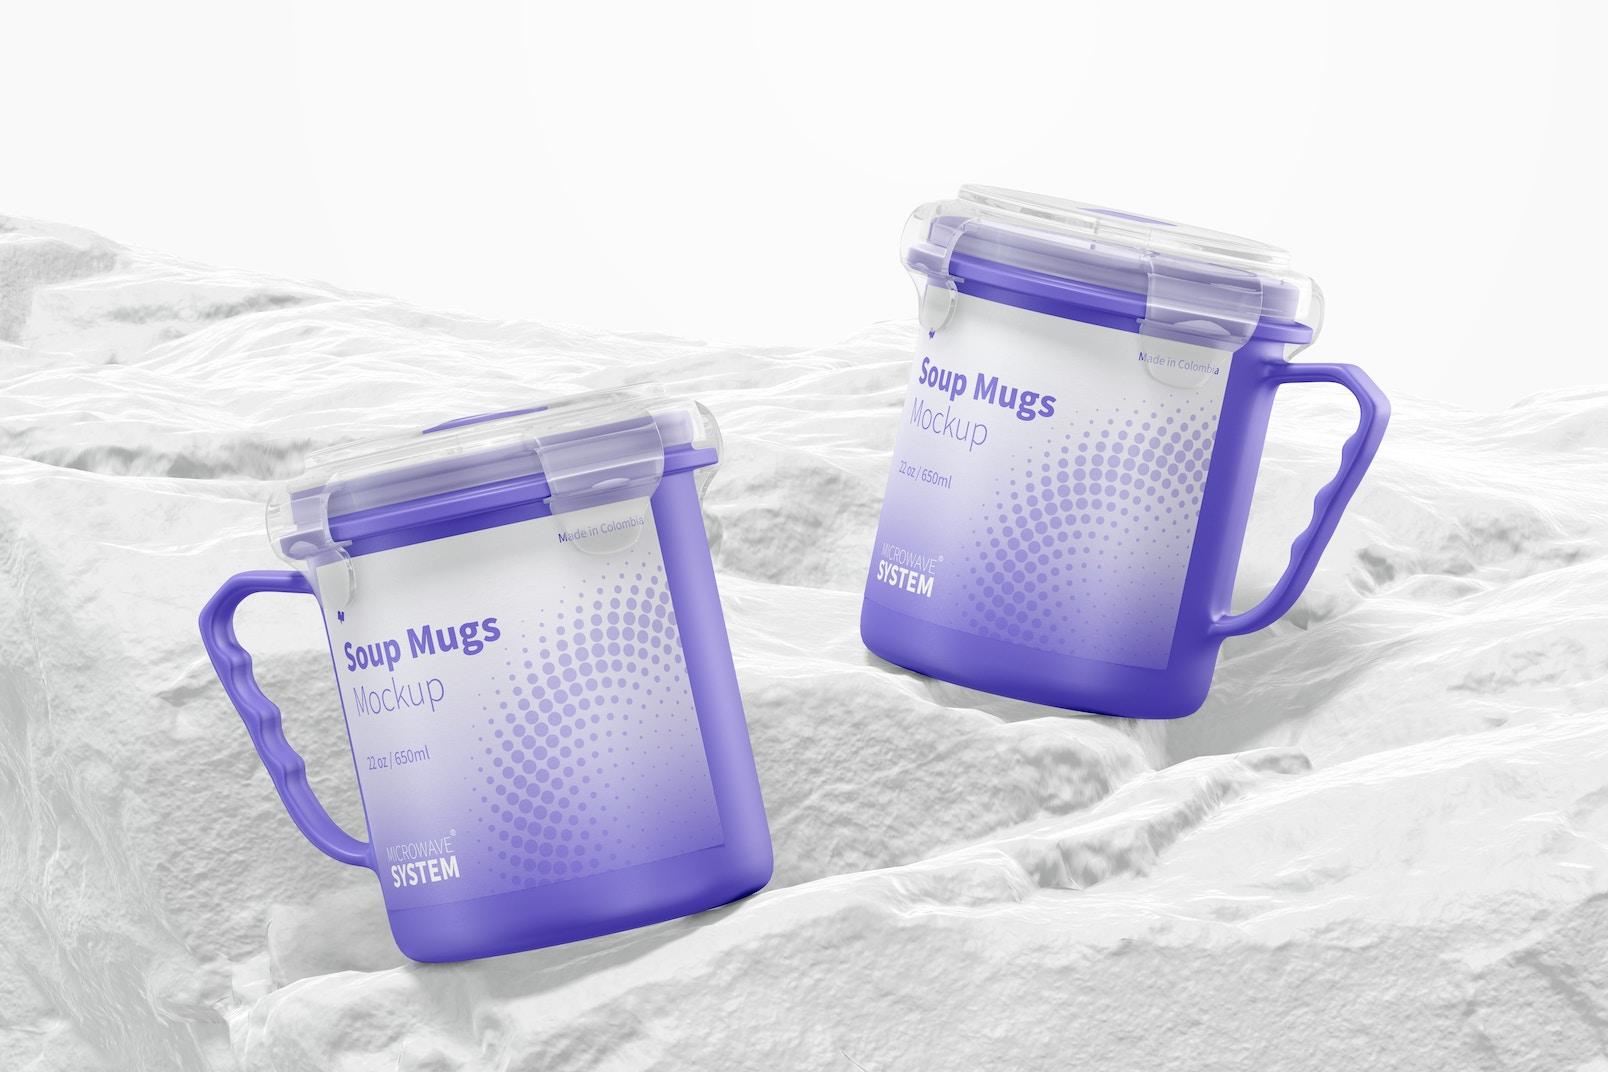 22 oz Soup Mugs Mockup, Front View